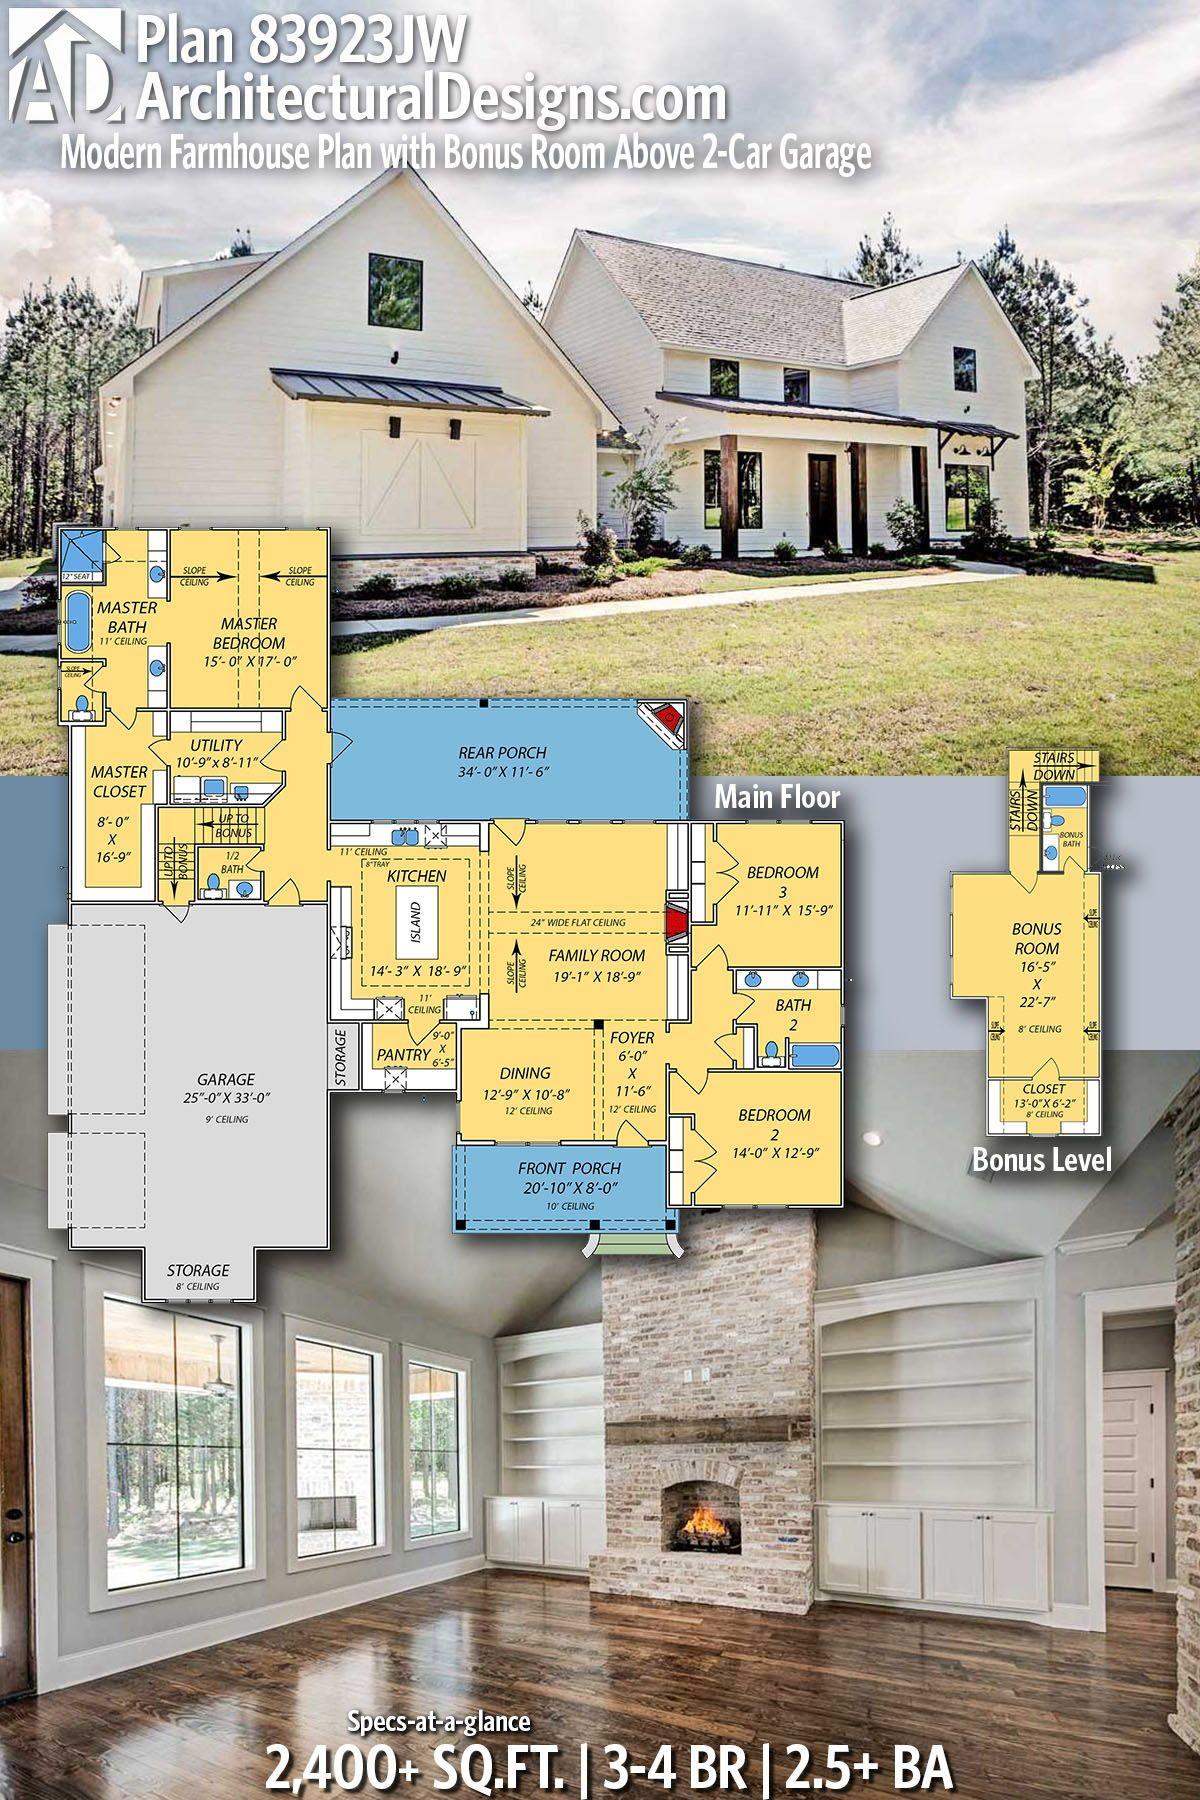 Plan 83923jw Modern Farmhouse Plan With Bonus Room Above 3 Car Garage Modern Farmhouse Plans Farmhouse Plans House Plans Farmhouse